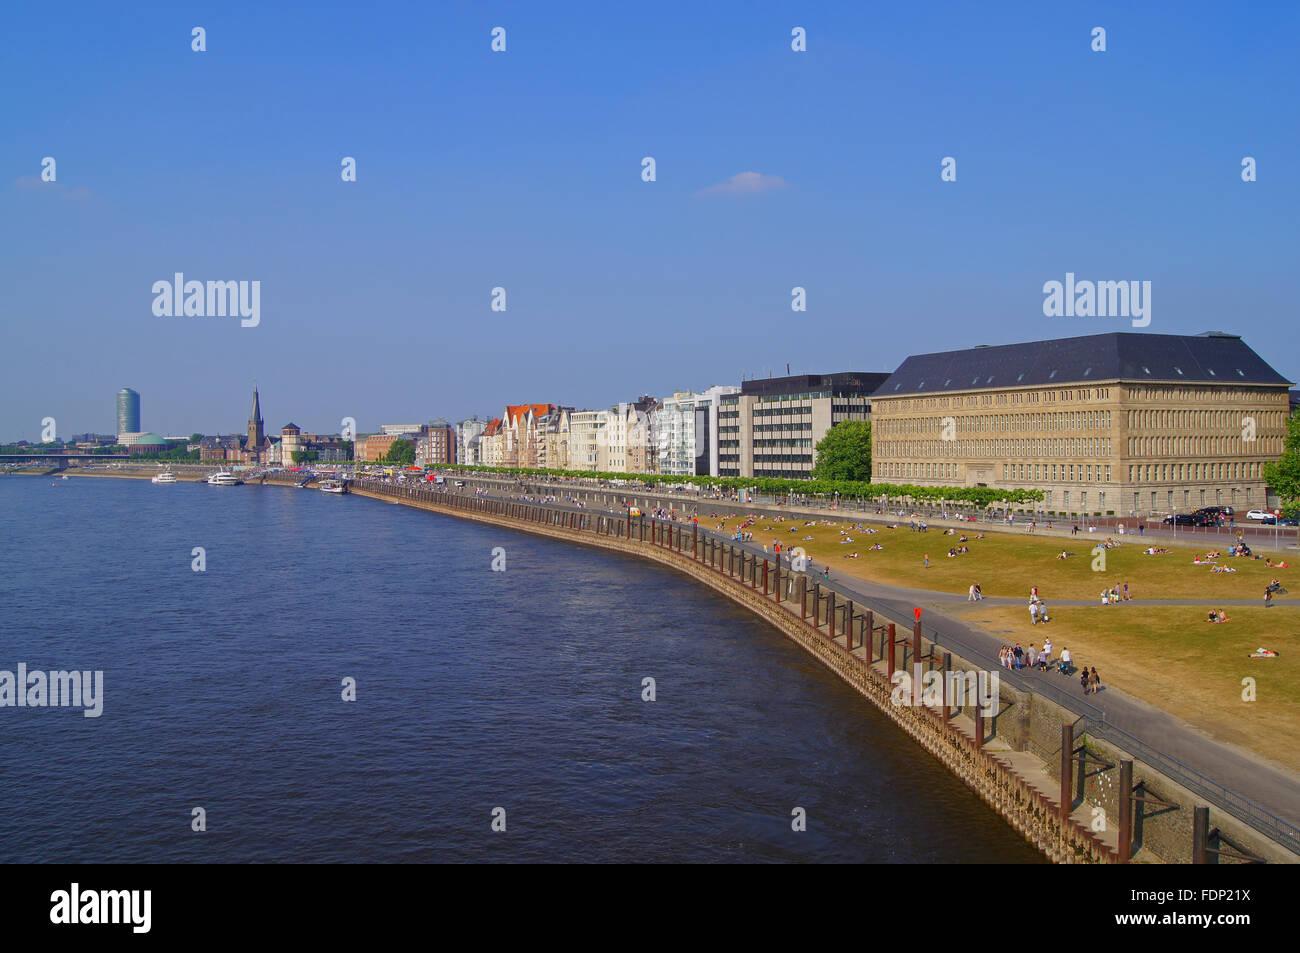 düsseldorf,rhine river,rhine promenade - Stock Image